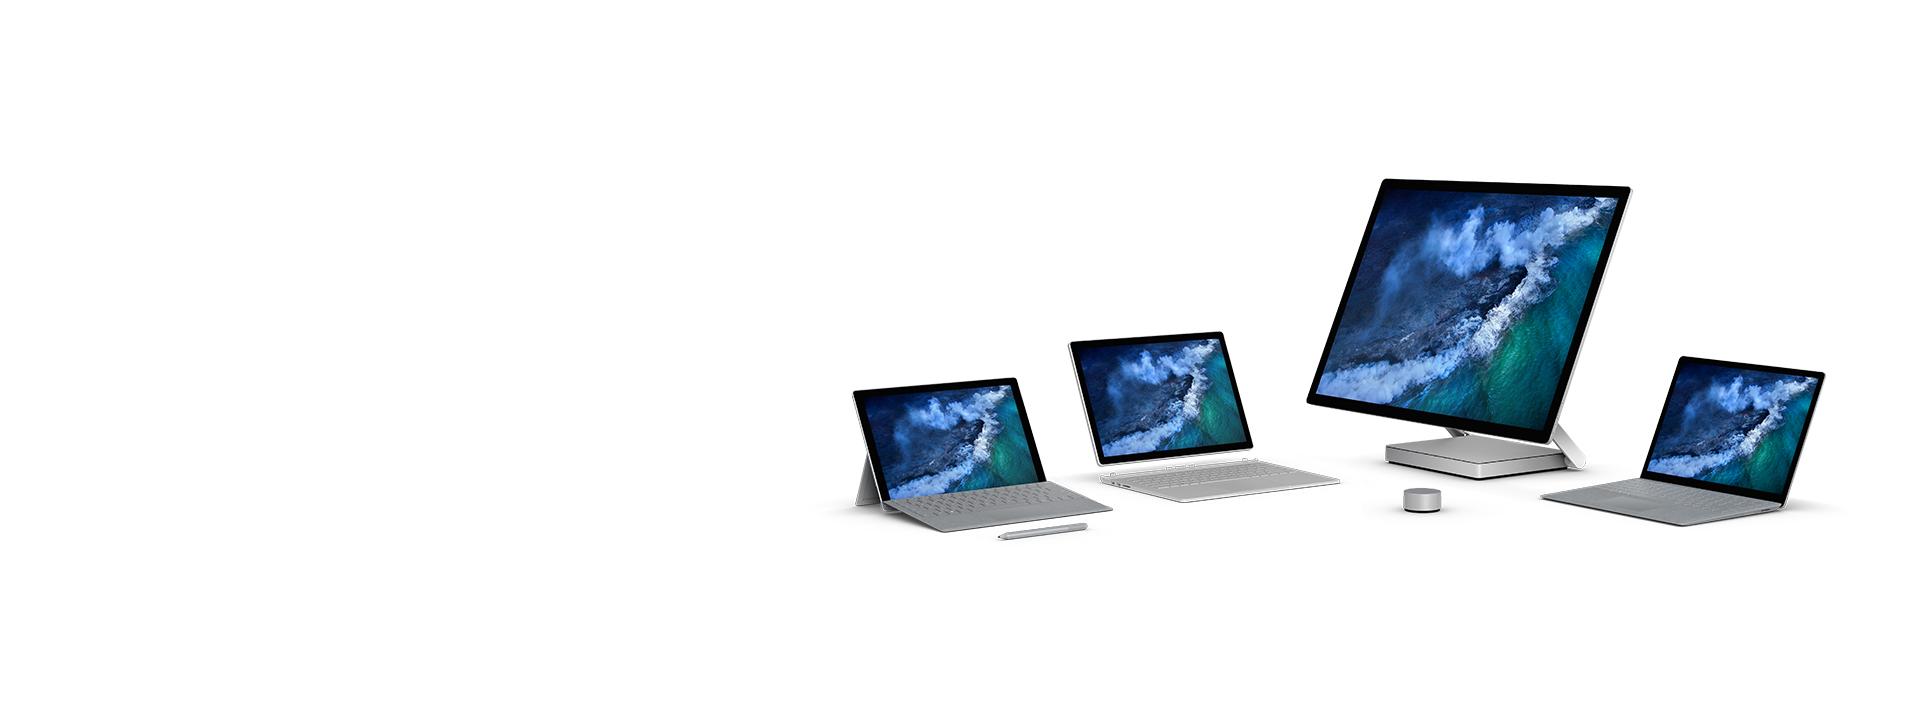 Famille Surface: SurfacePro, SurfaceLaptop, Surface Book 2 et SurfaceStudio